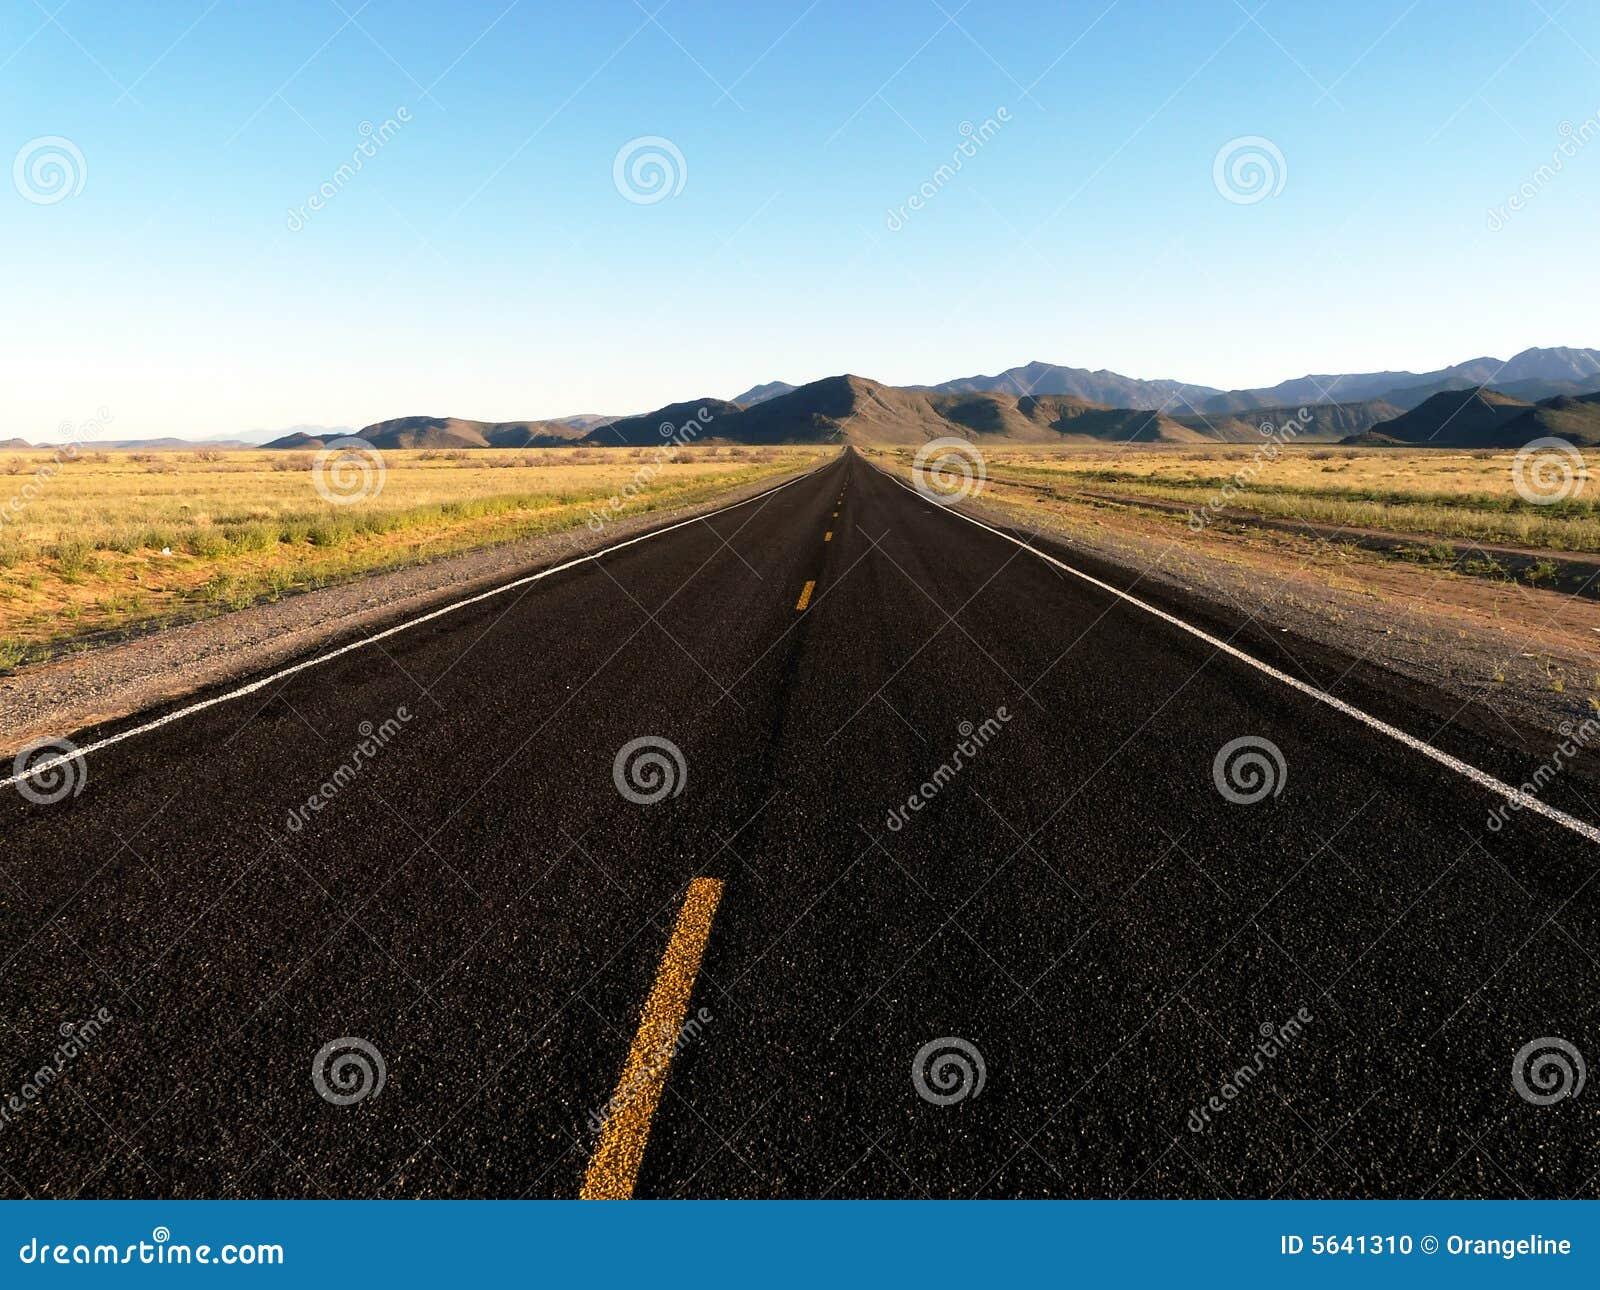 Vacant Road - Horizontal Stock Photo - Image: 5641310